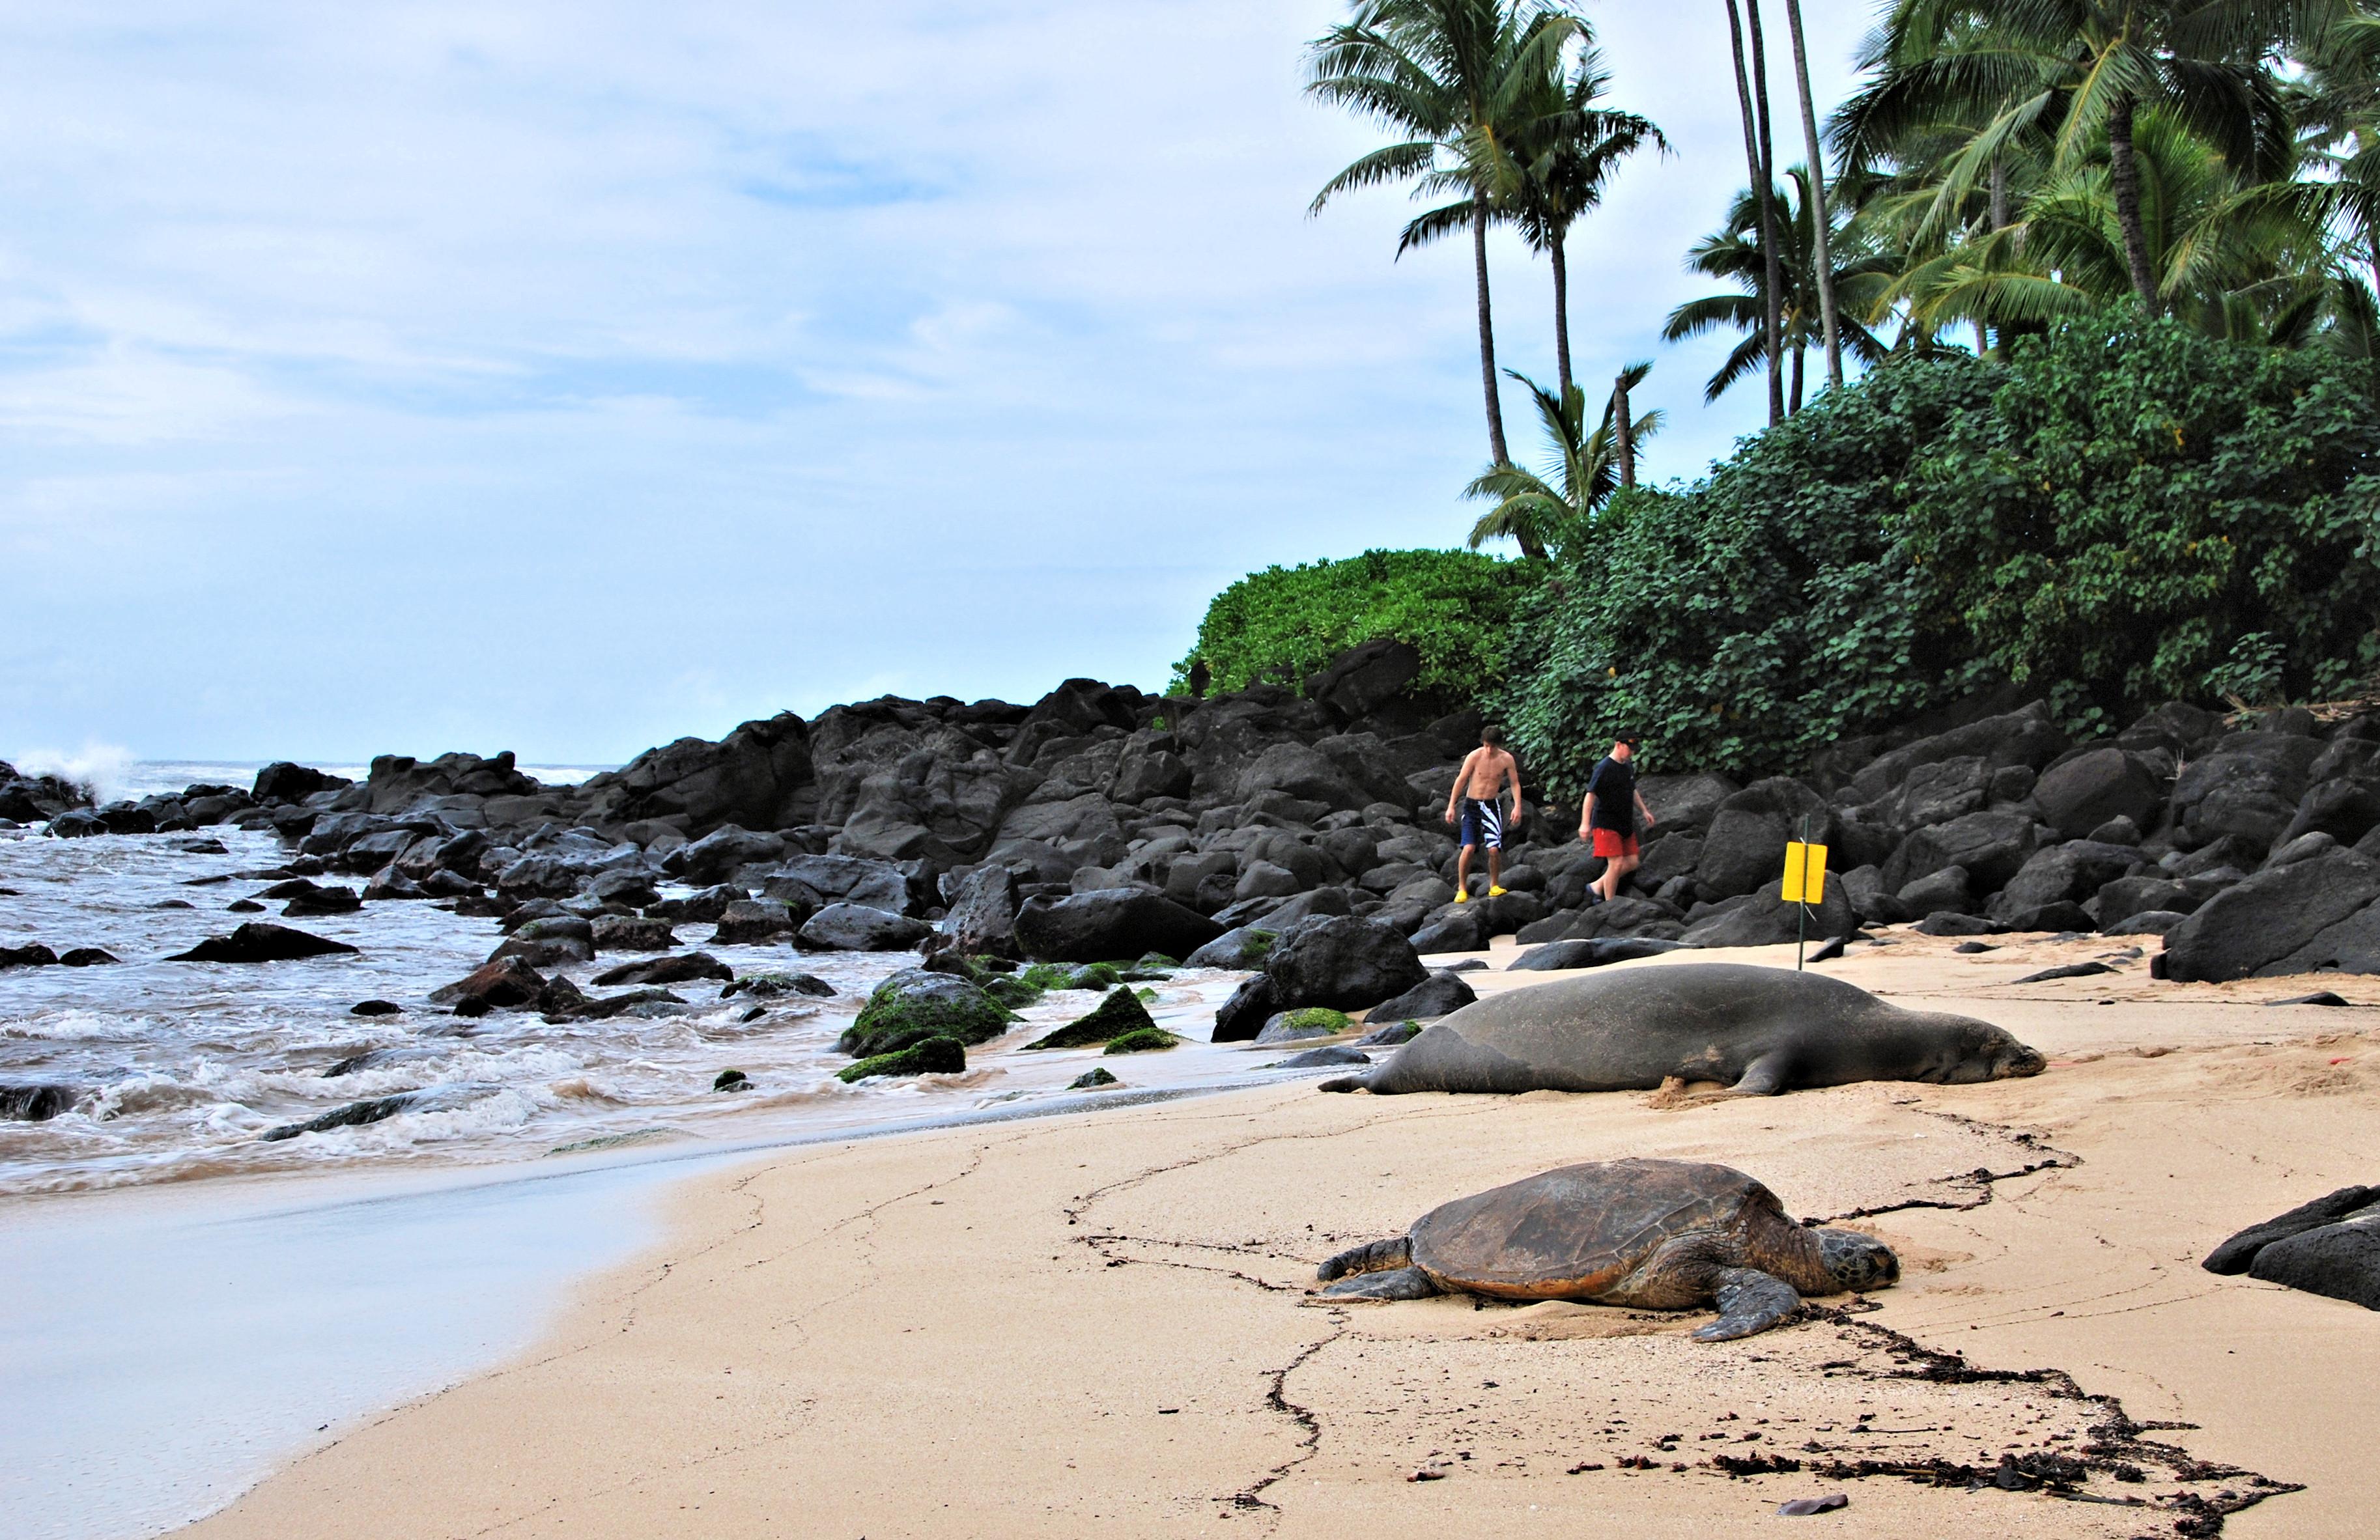 File:Laniakea Beach 04.jpg - Wikimedia Commons